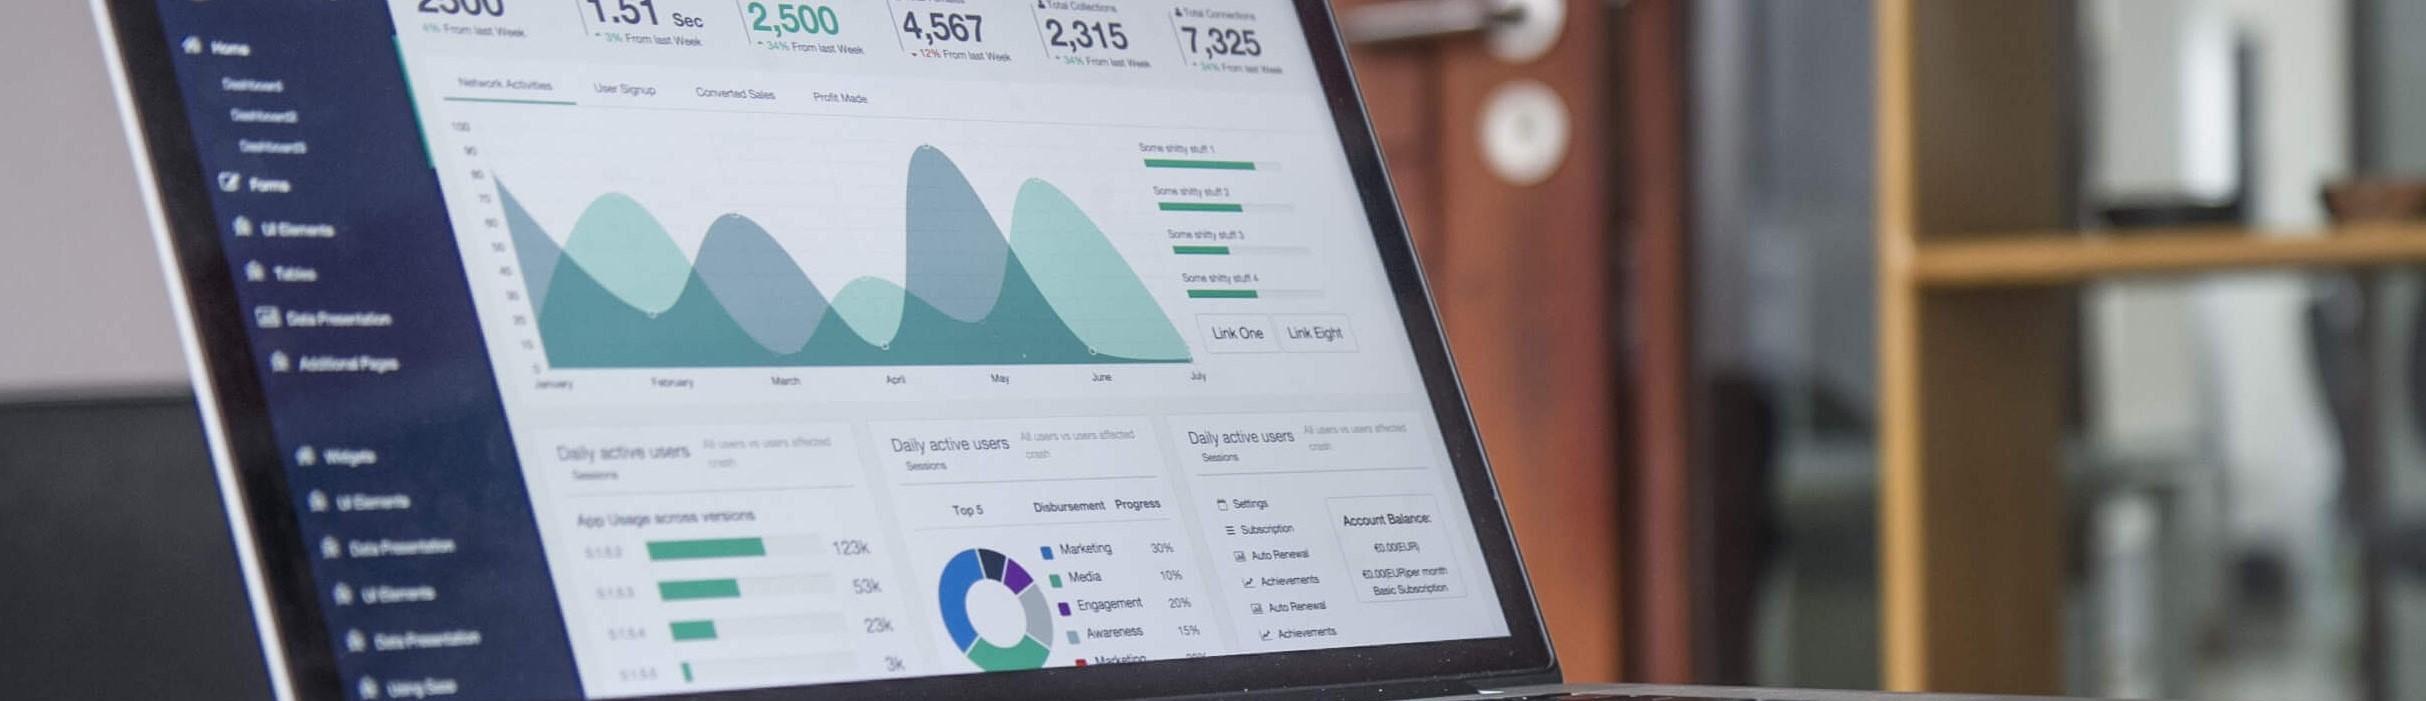 Digital marketing analyse